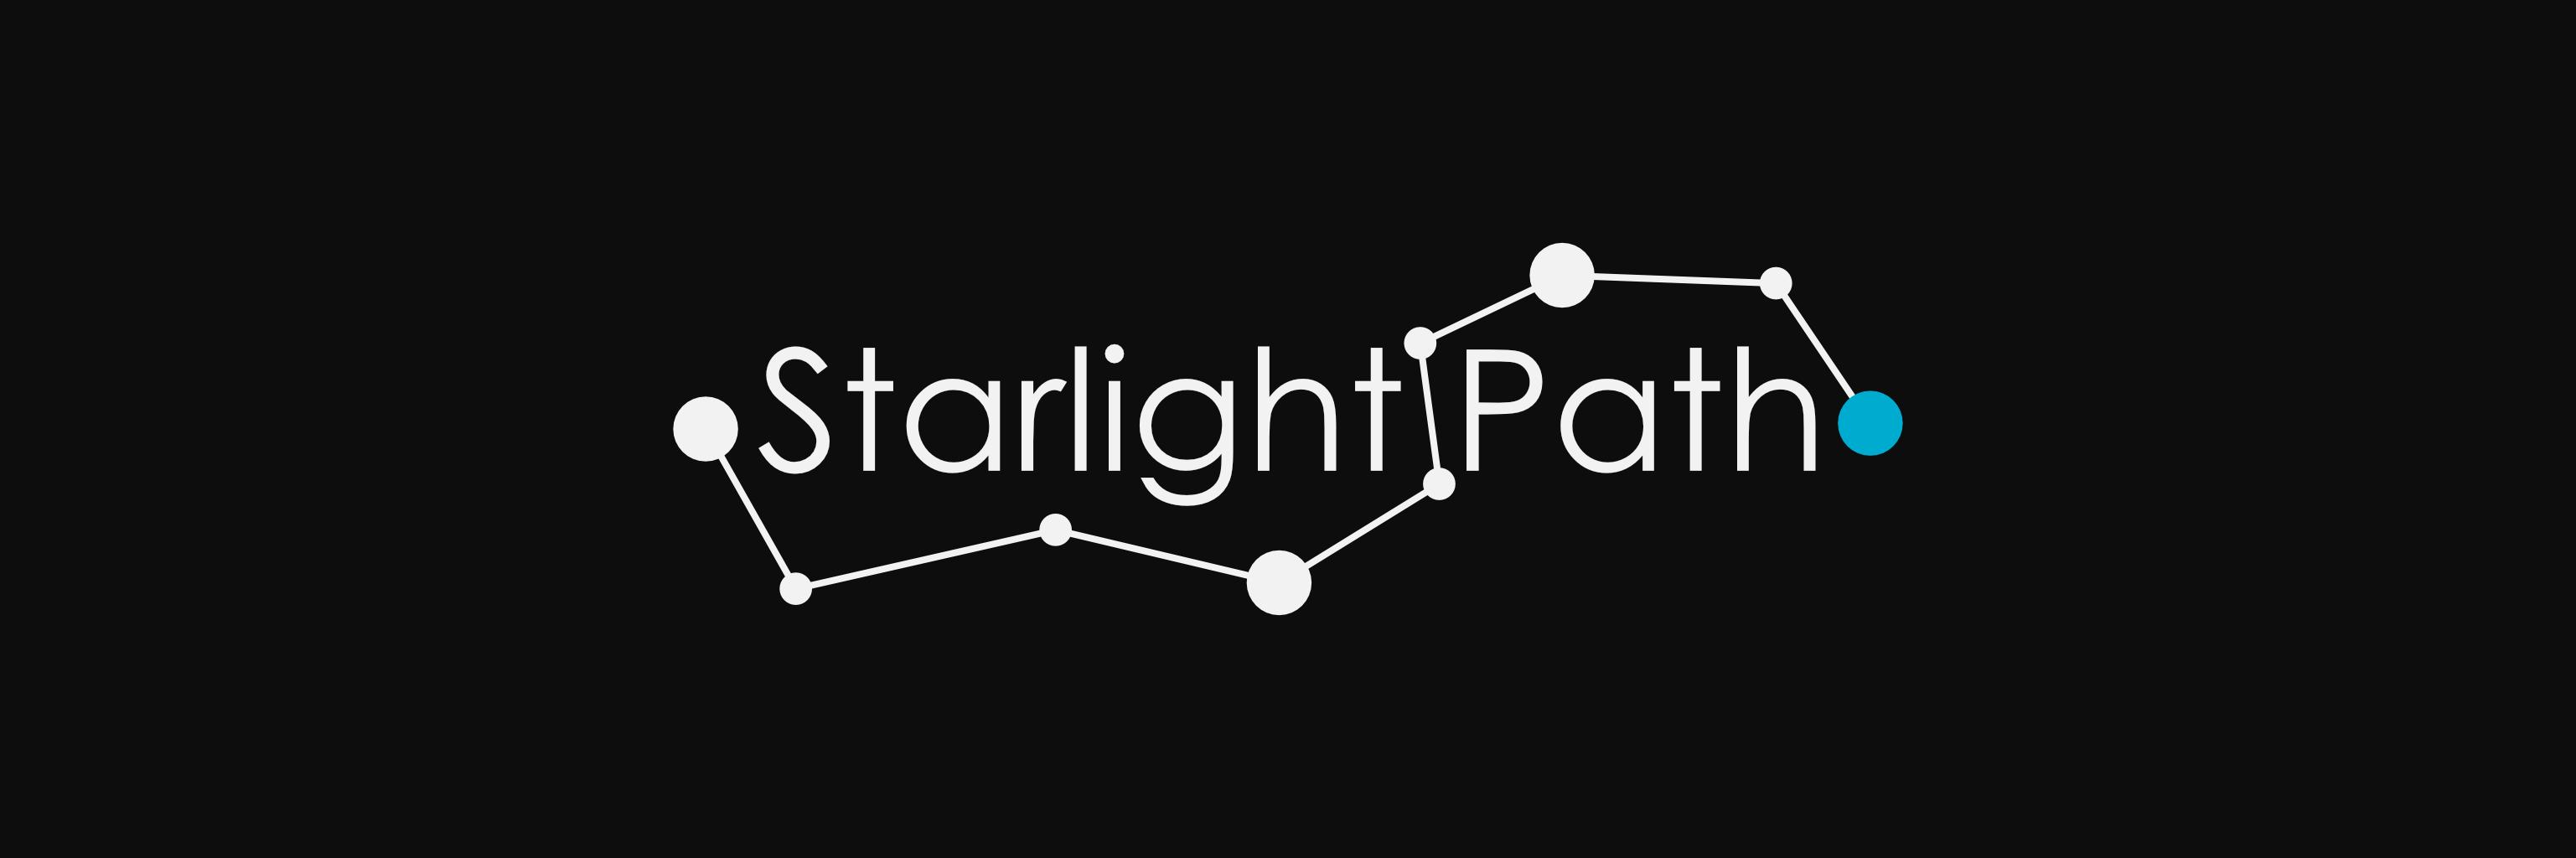 Starlight Path